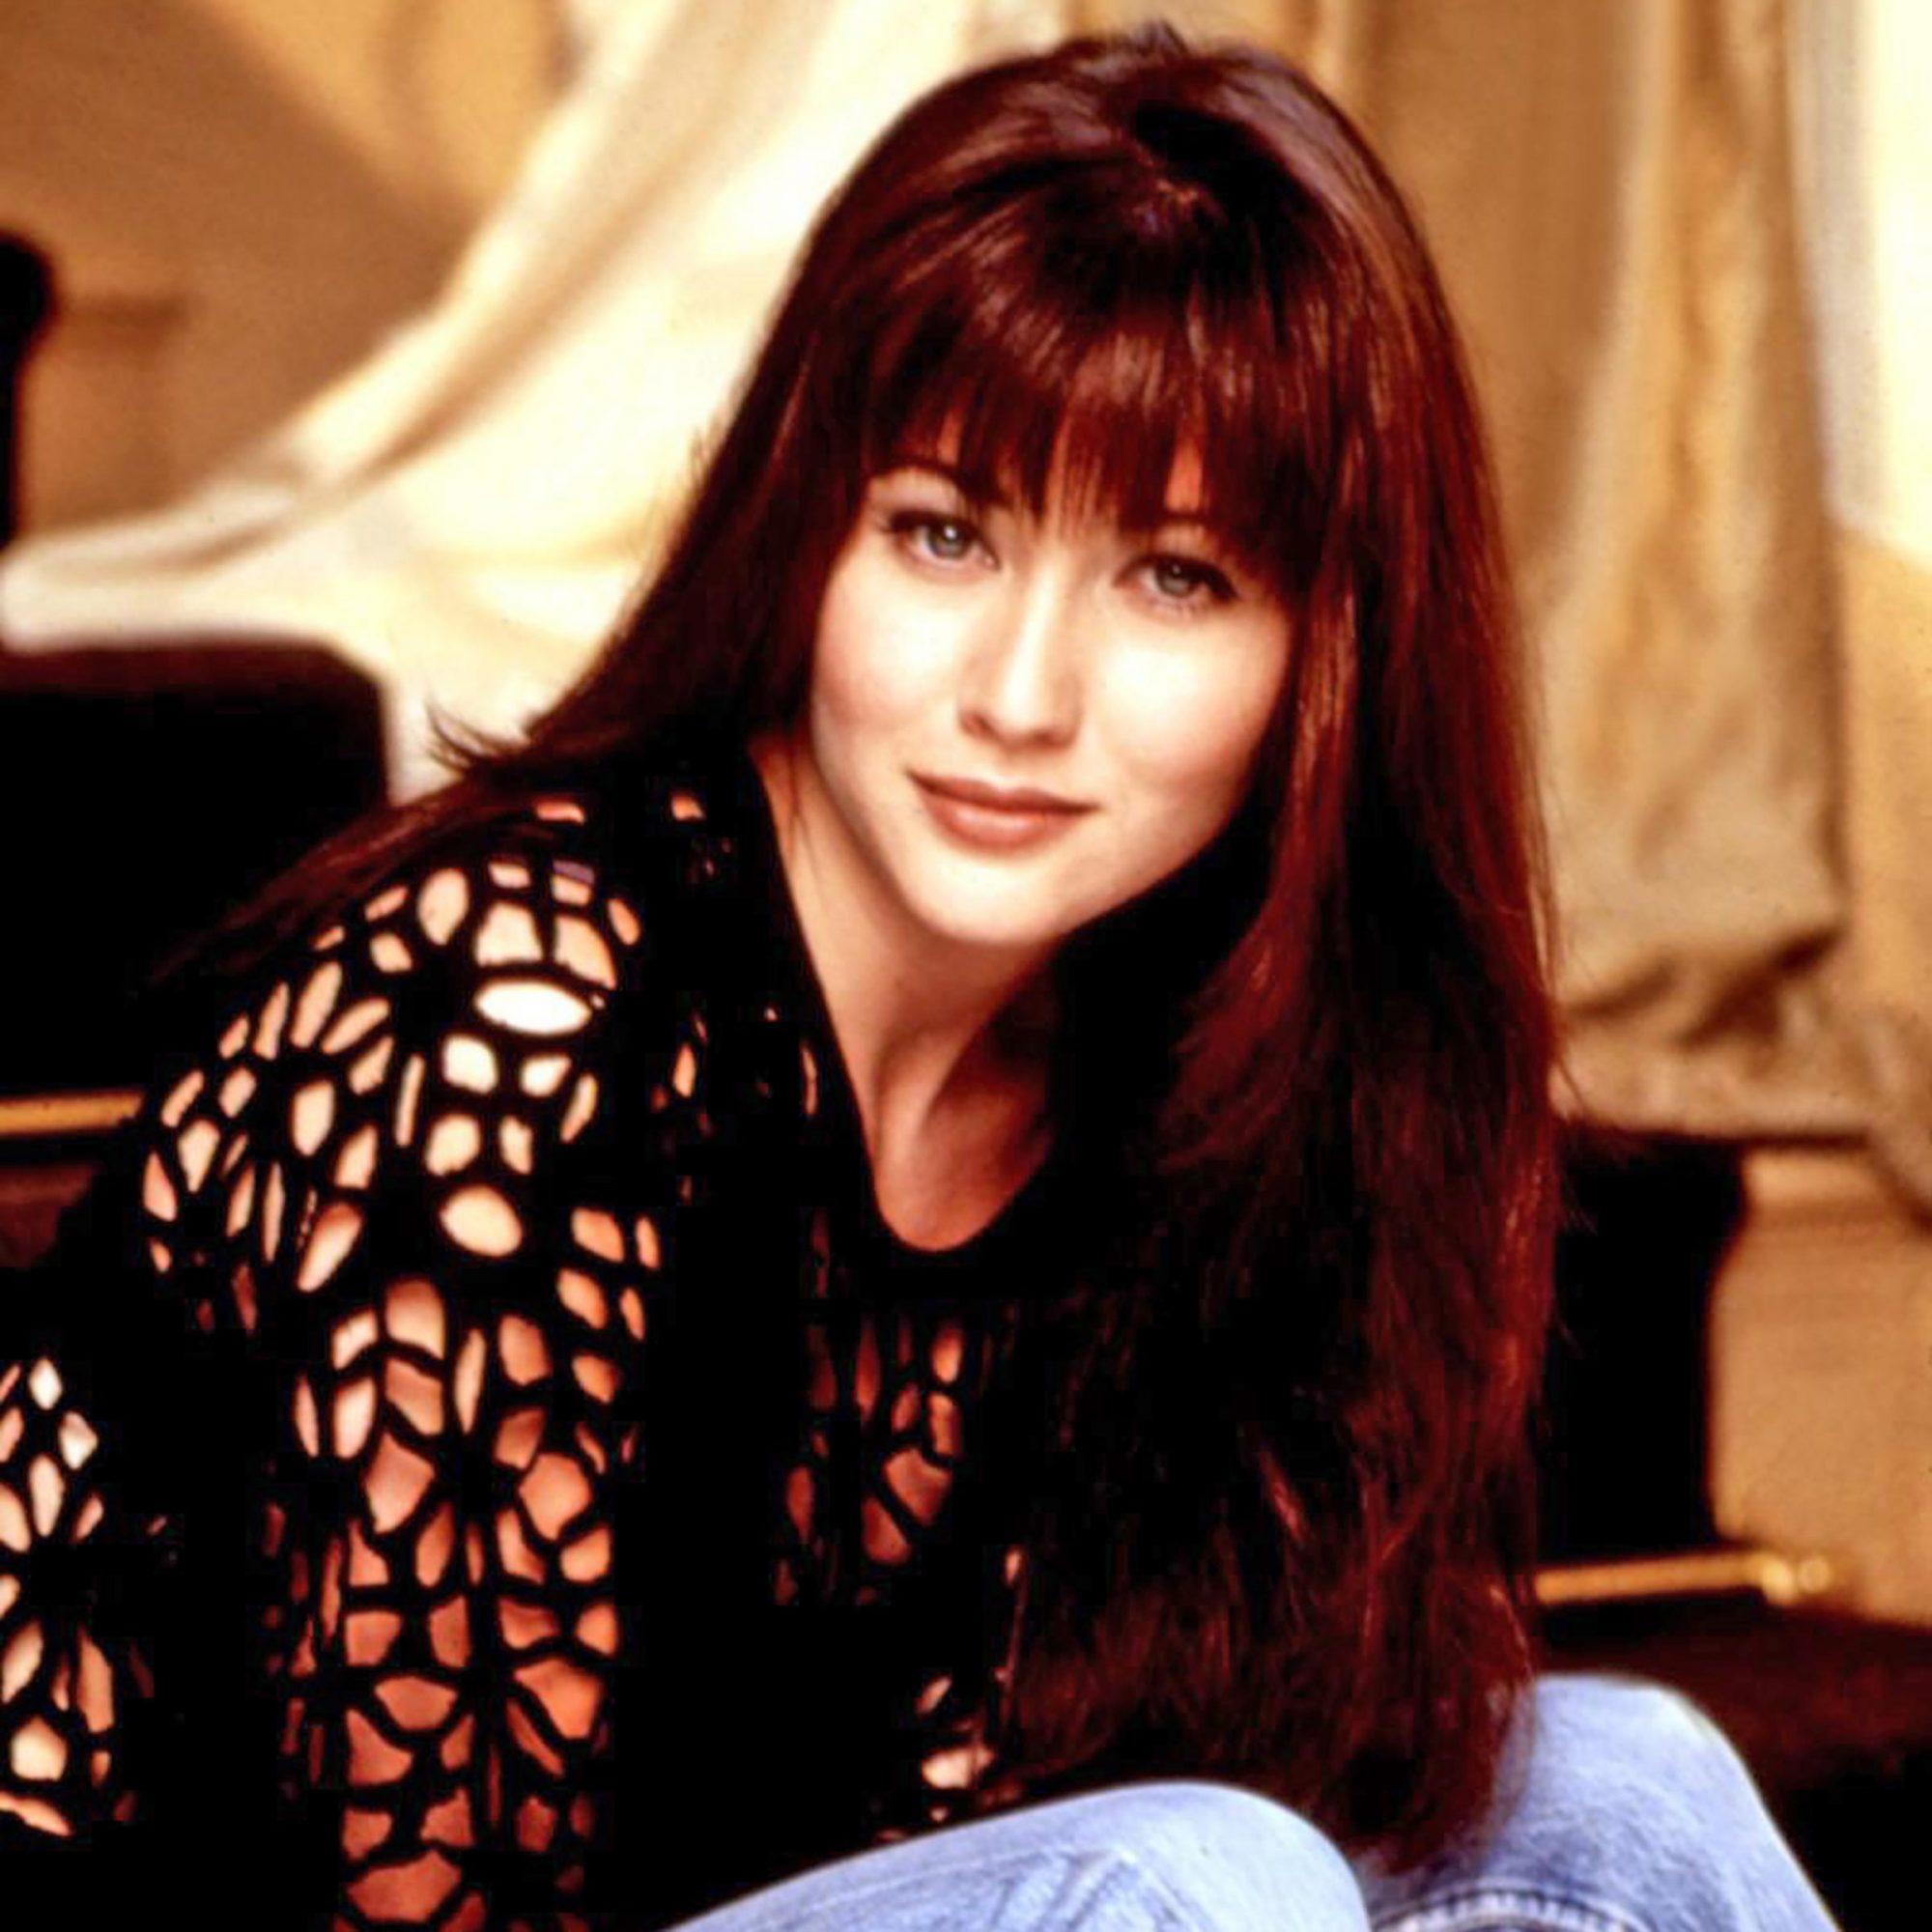 BEVERLY HILLS, 90210, 1990-2000, Shannen Doherty, 1990-94